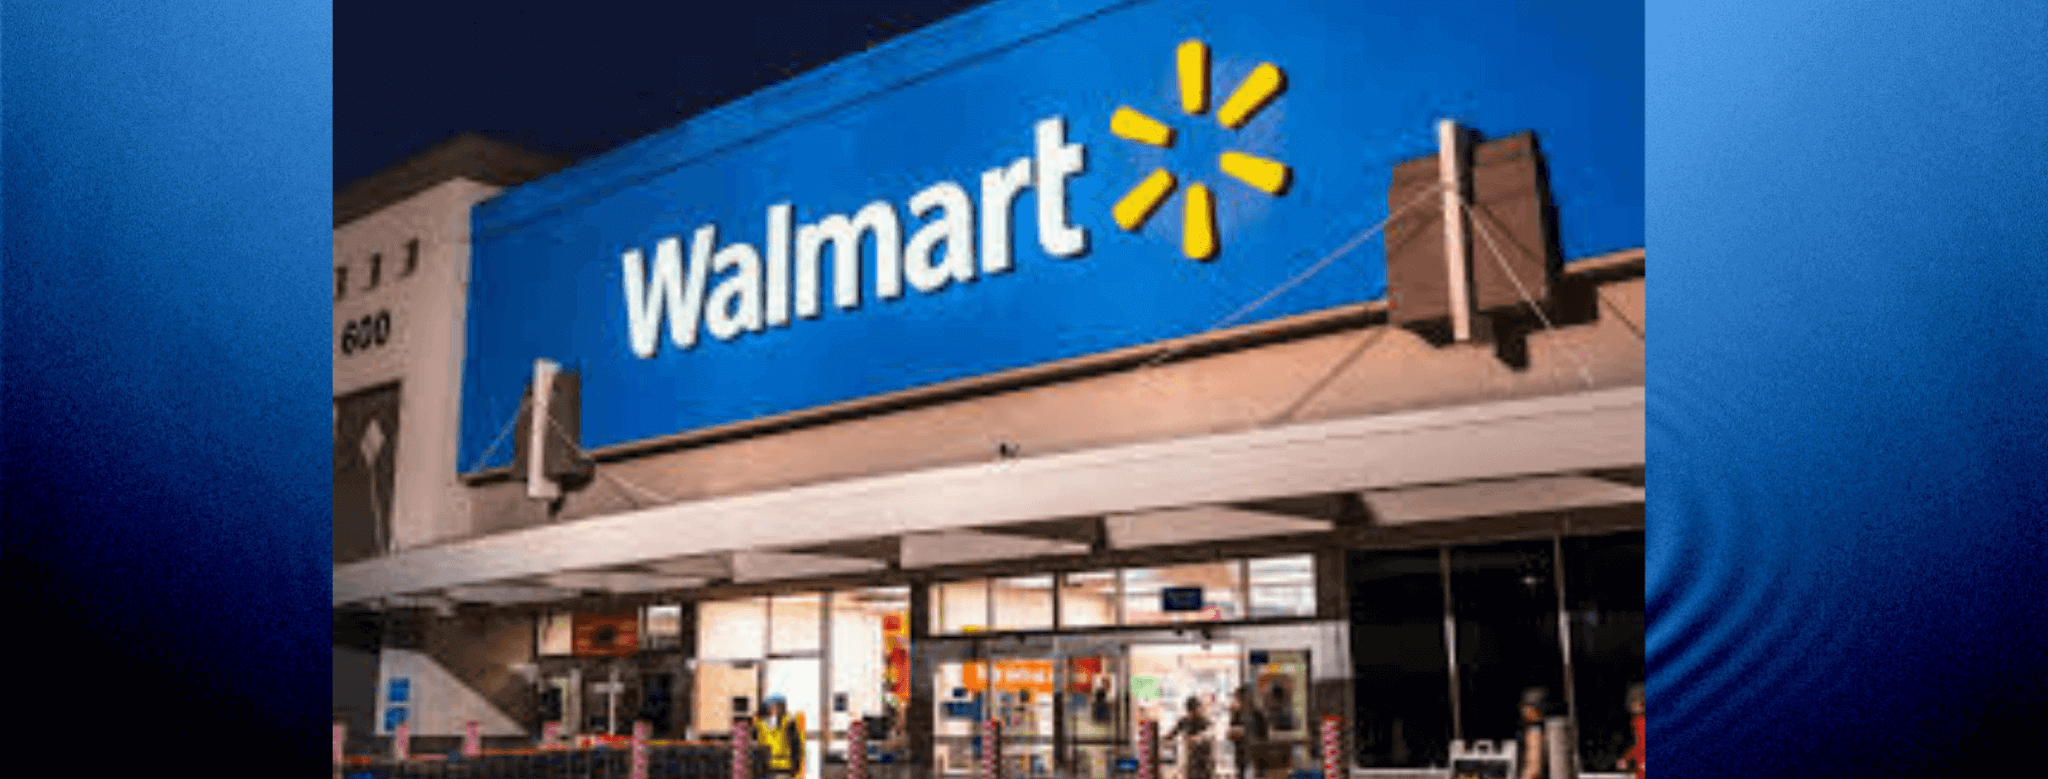 Walmart startup news